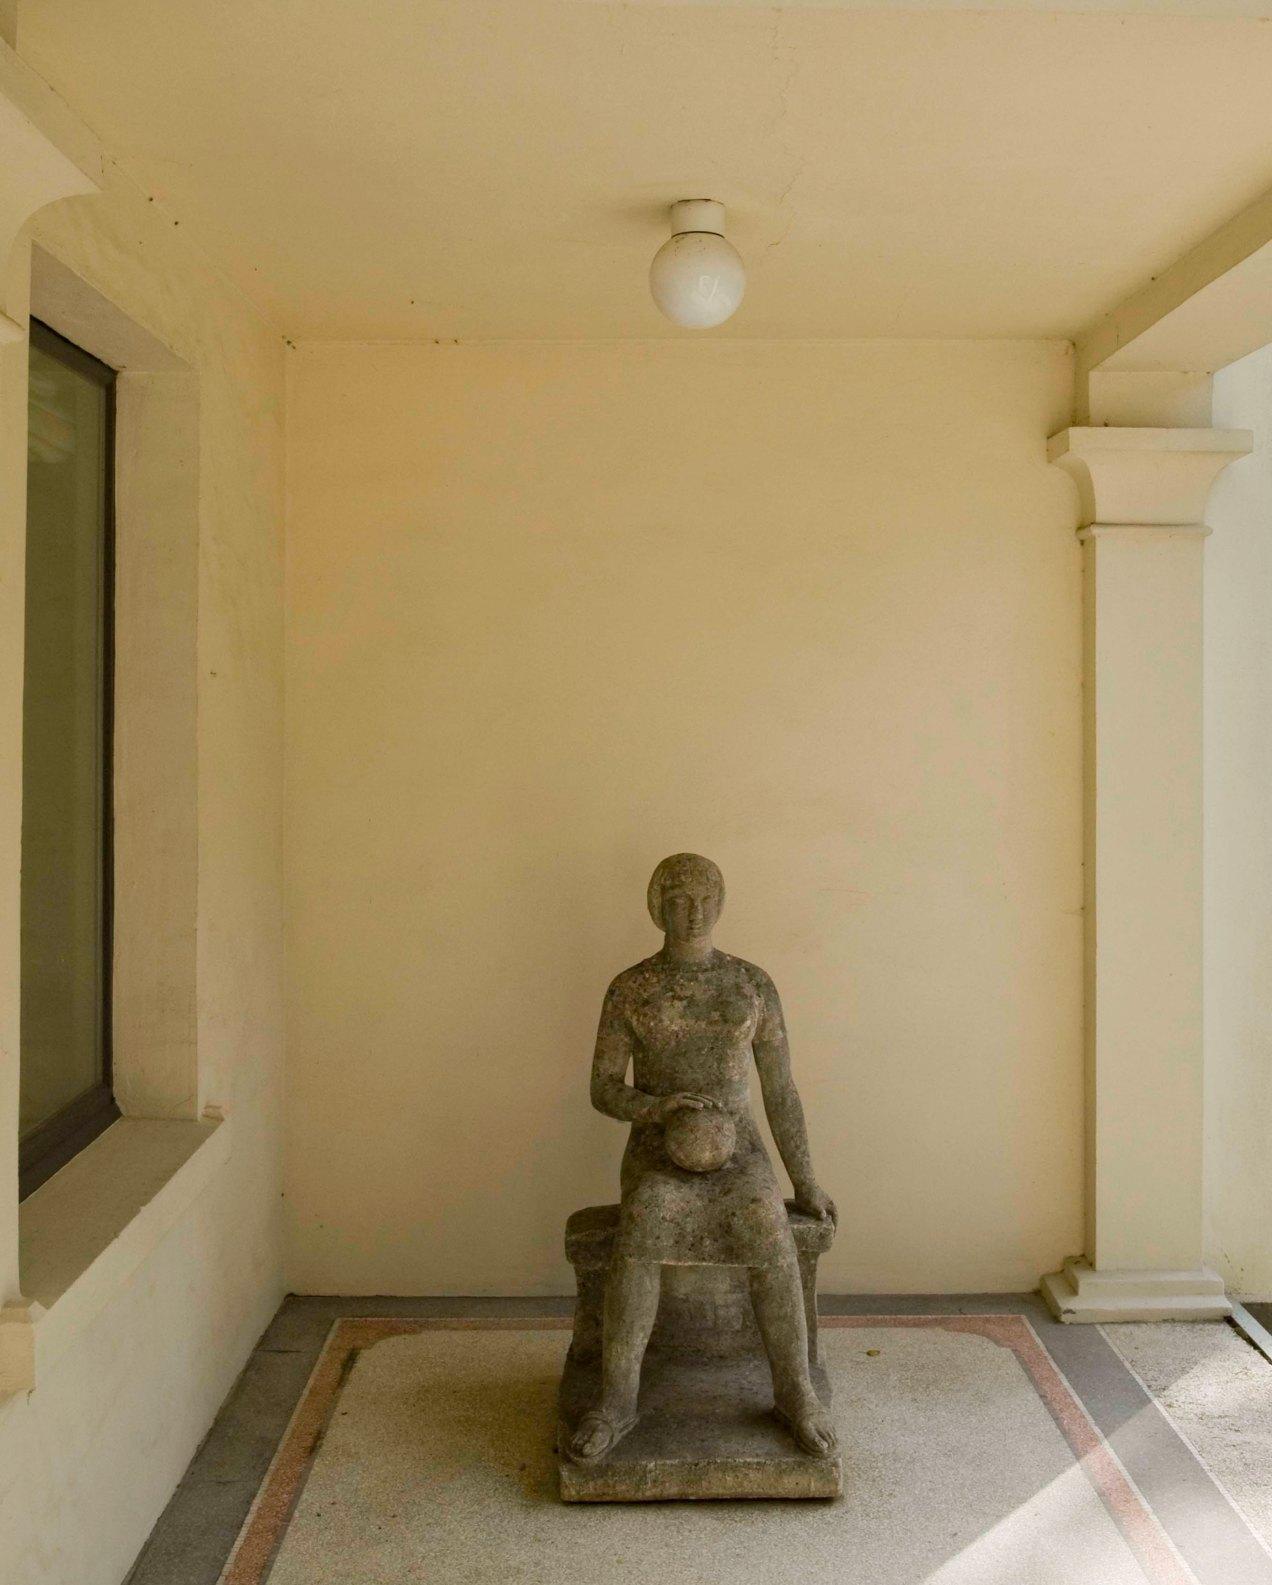 Sculpture, Karel Aubroeck, Vil, Belgique, gildalliere, 2011